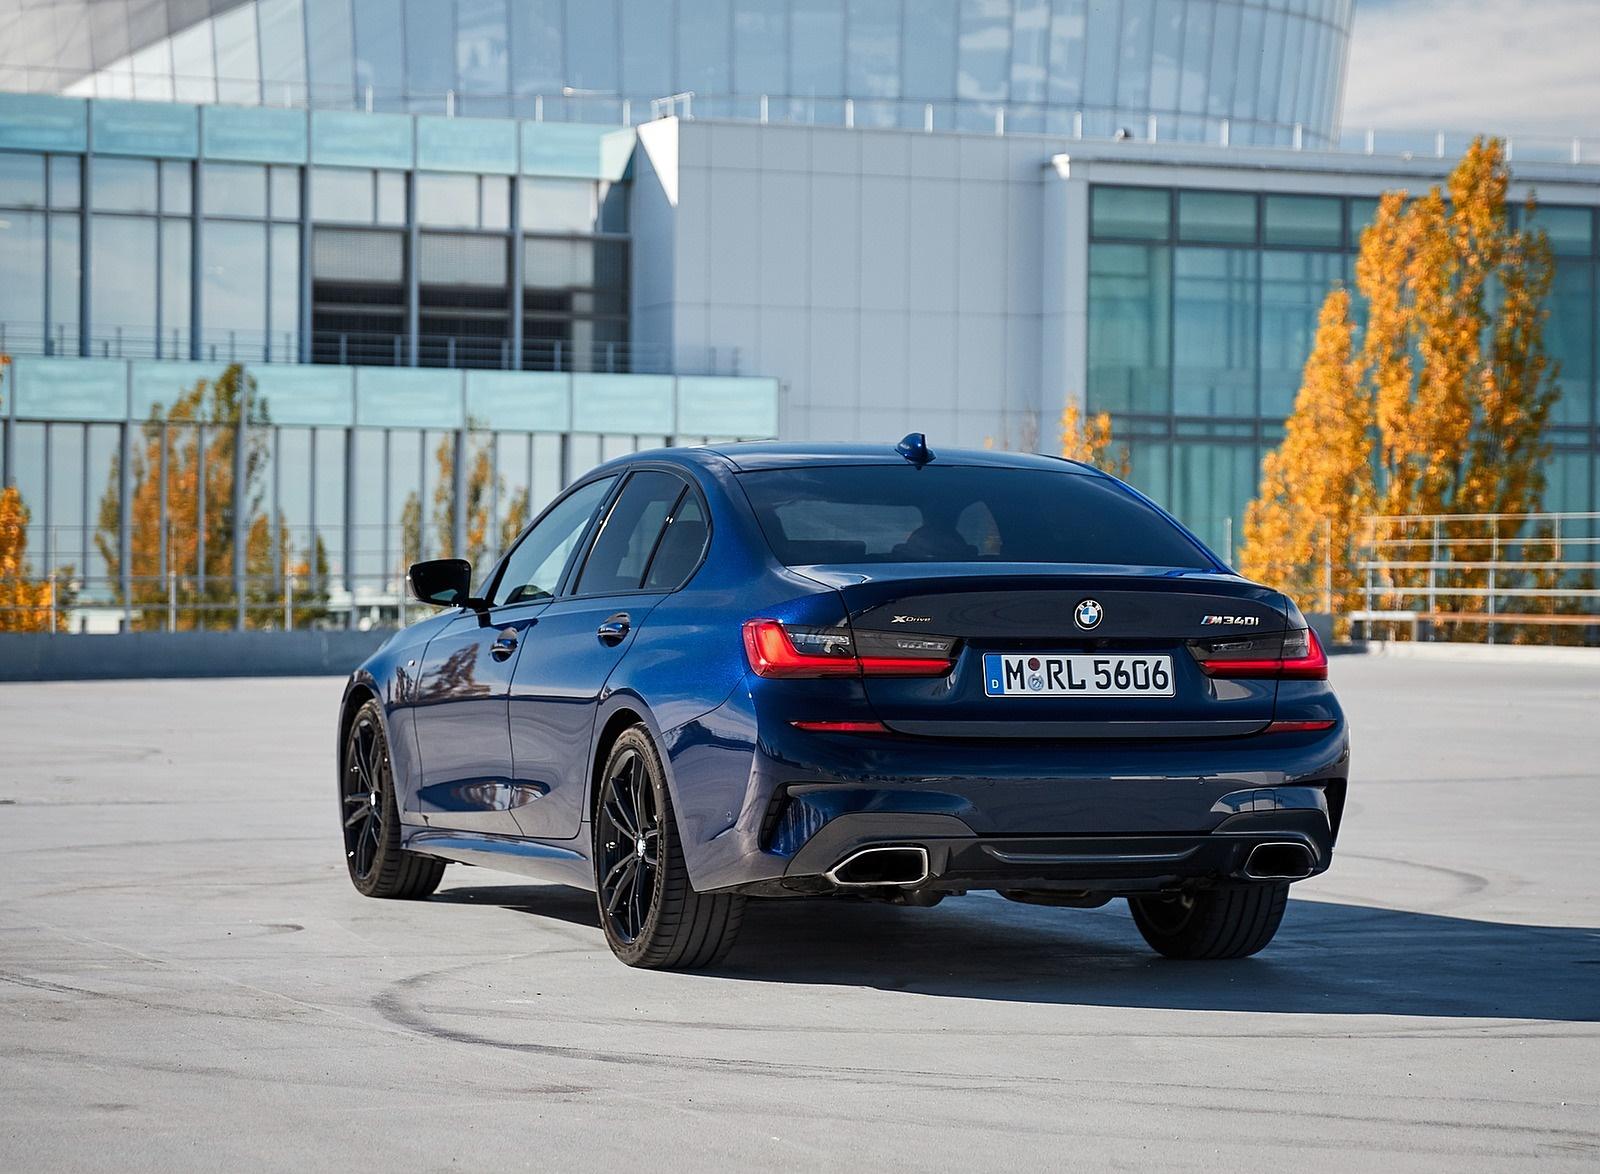 2020 BMW M340i Sedan (Color: Tanzanite Blue Metallic) Rear Three-Quarter Wallpapers #45 of 74